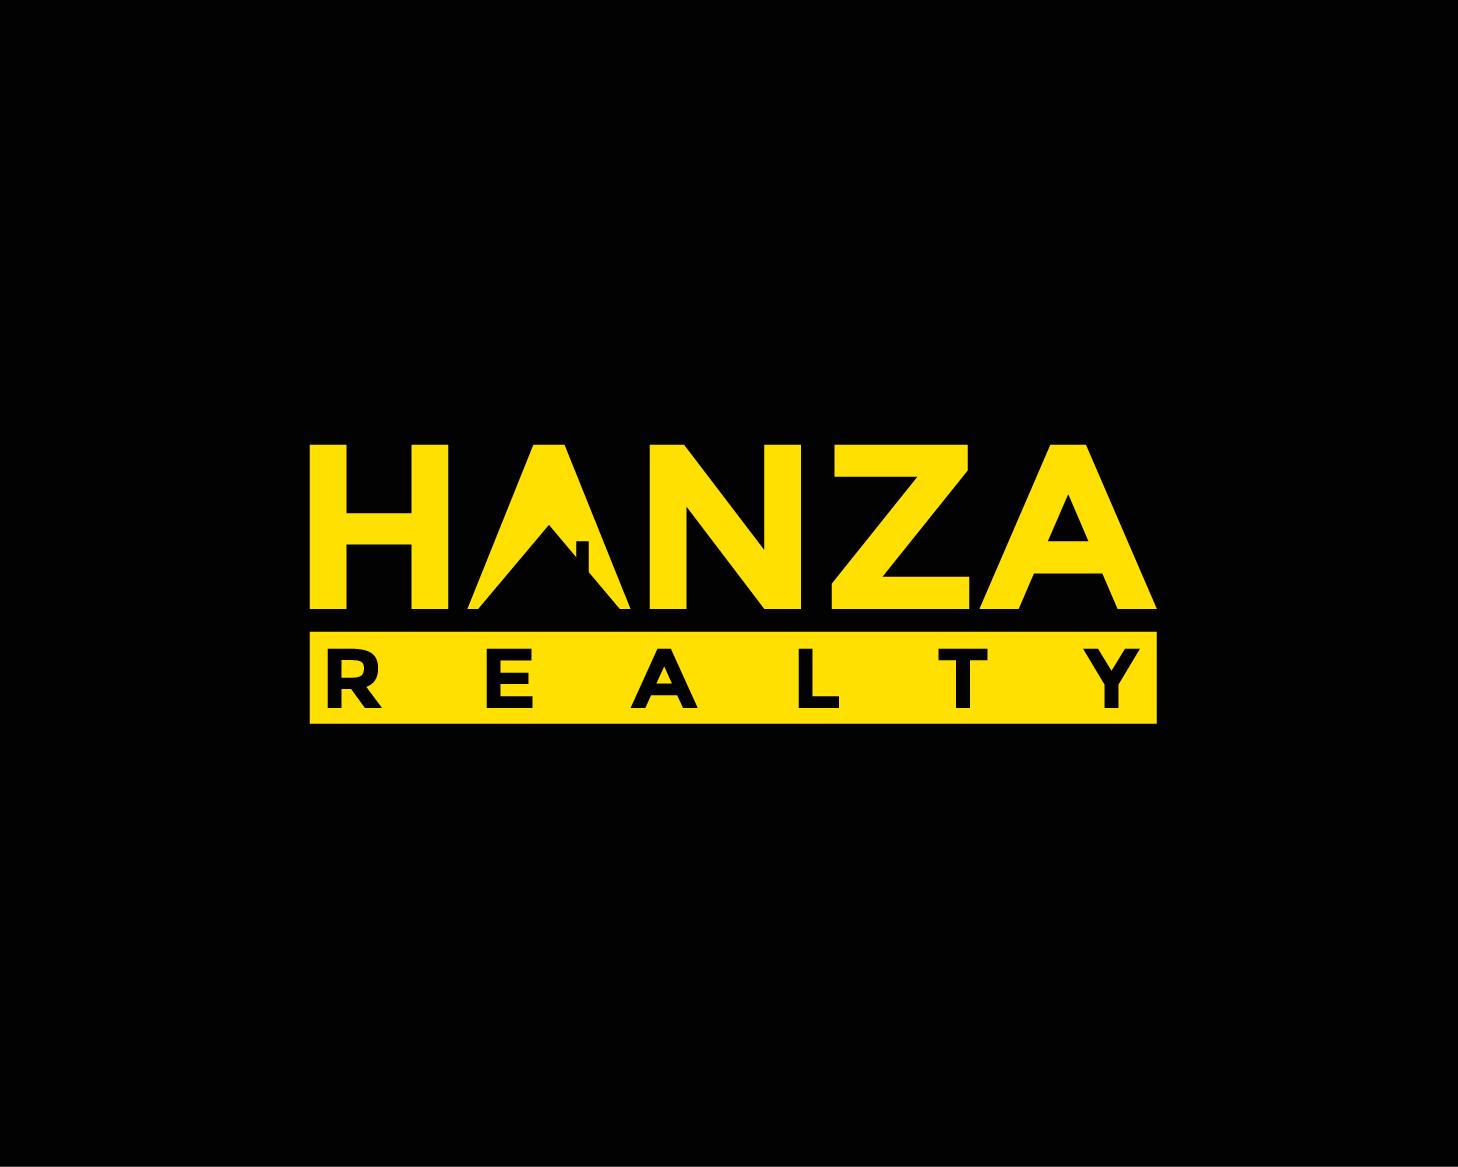 Logo Design by Allan Esclamado - Entry No. 10 in the Logo Design Contest Logo Design for Hanza Realty.